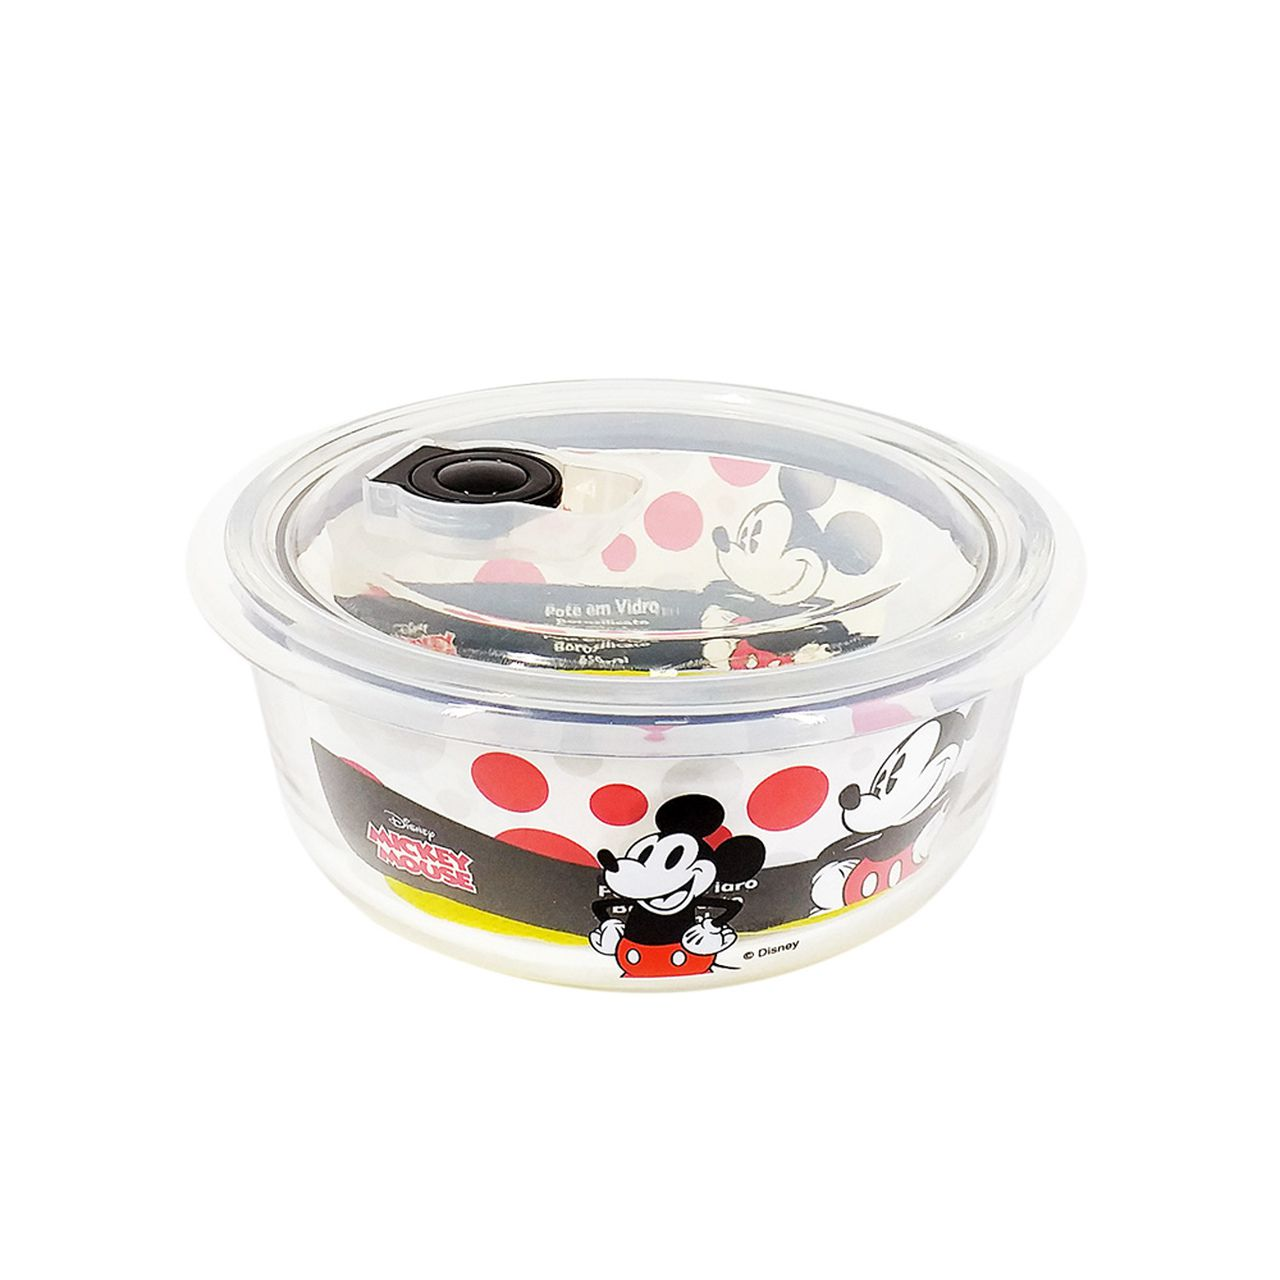 Pote de Vidro Com Tampa e Válvula (650ml): Mickey Mouse - Disney